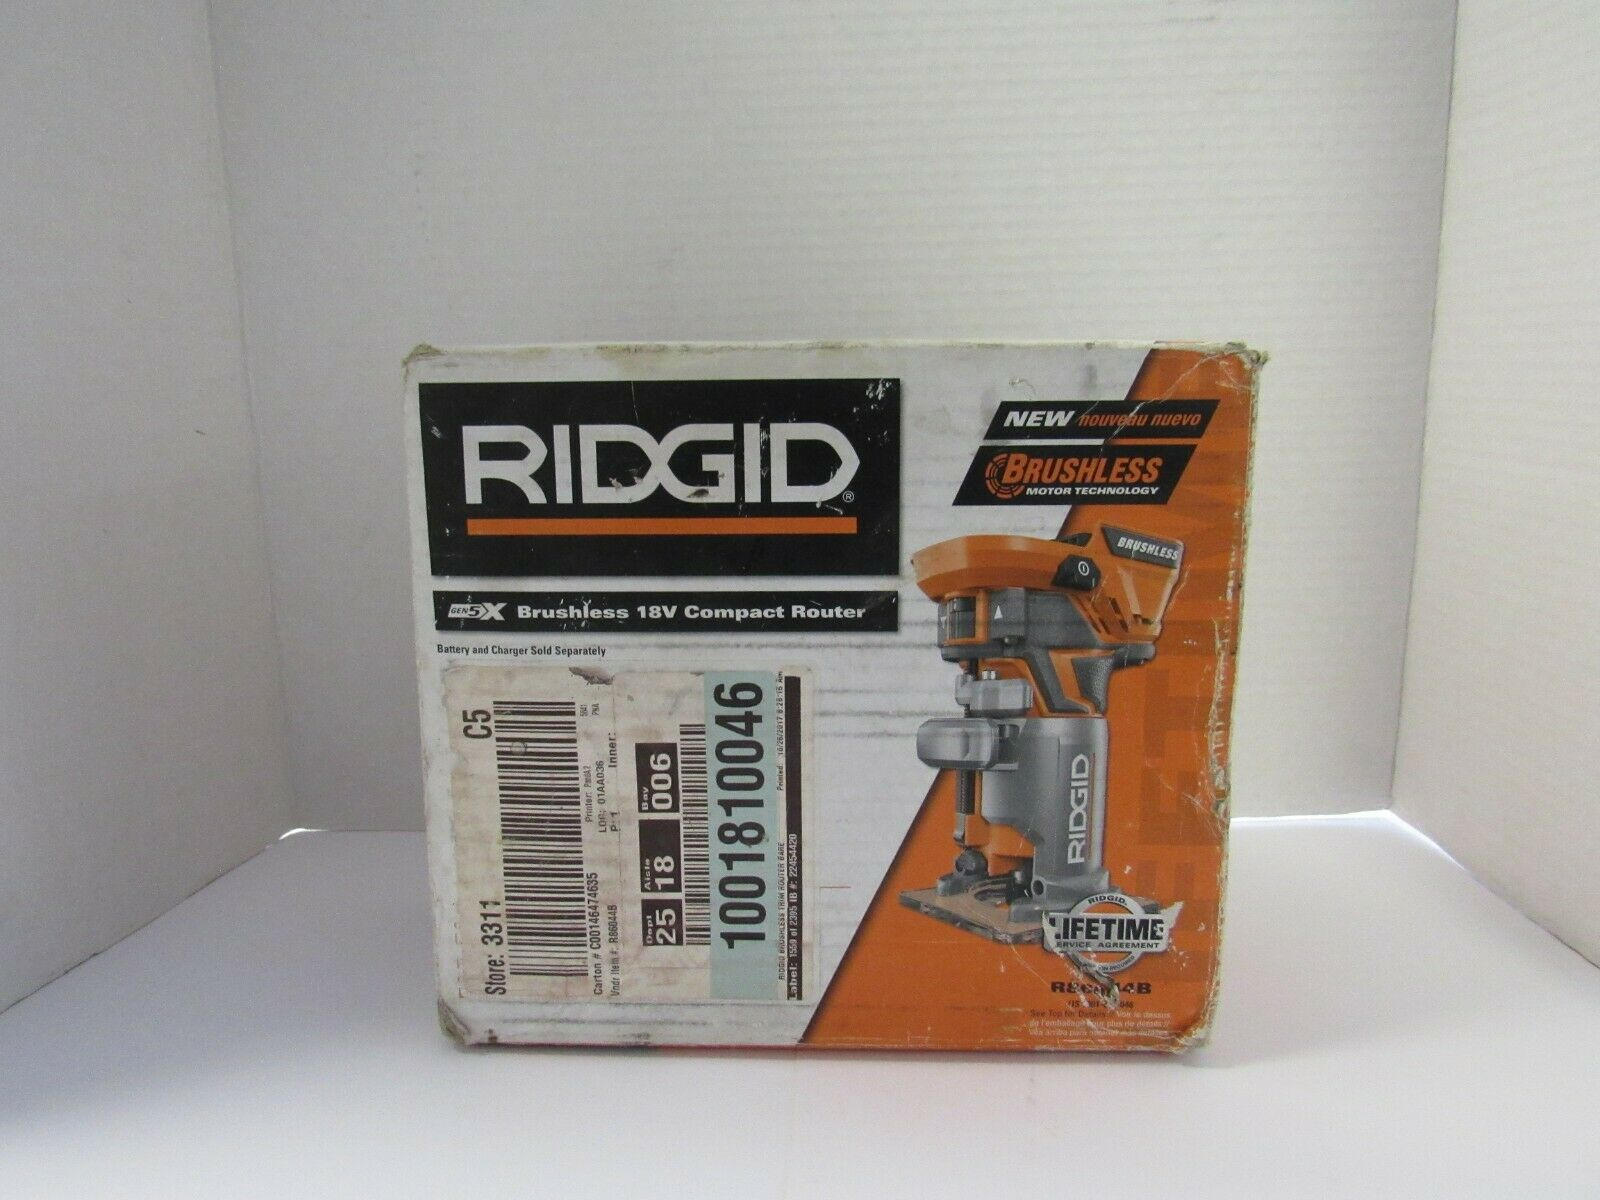 RIDGID 18-Volt Lithium-Ion Cordless Brushless Compact Router Kit